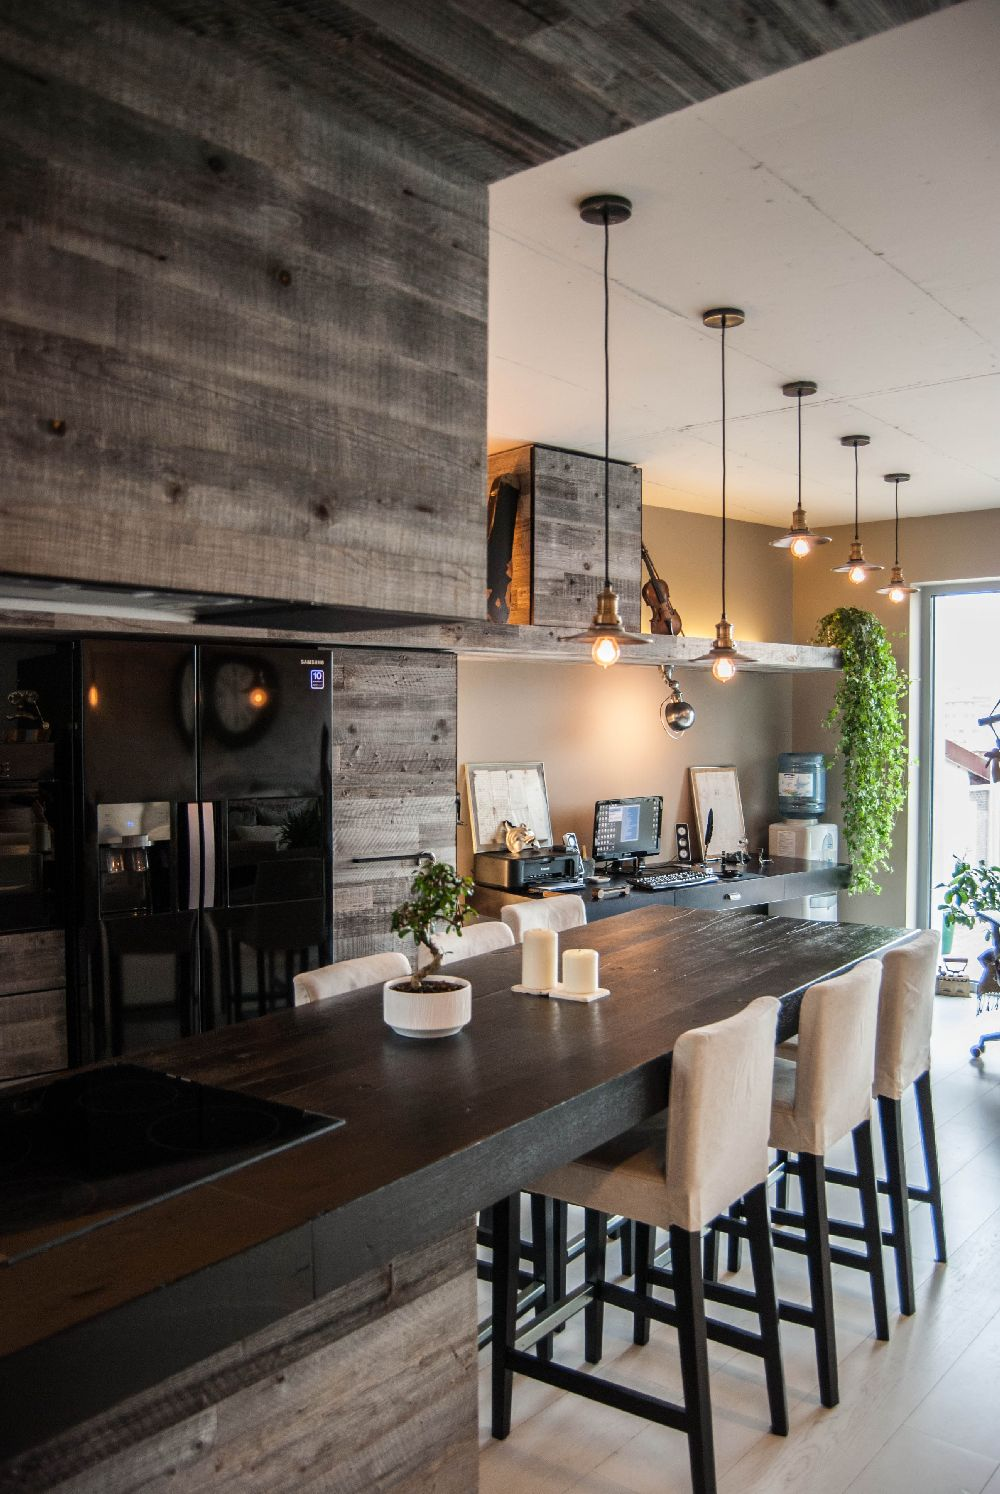 adelaparvu.com despre amenajare apartament cu lemn masiv, design interior arh Ciprian Manda, Foto Aliona Danielescu, Niculae Stoleriu (11)